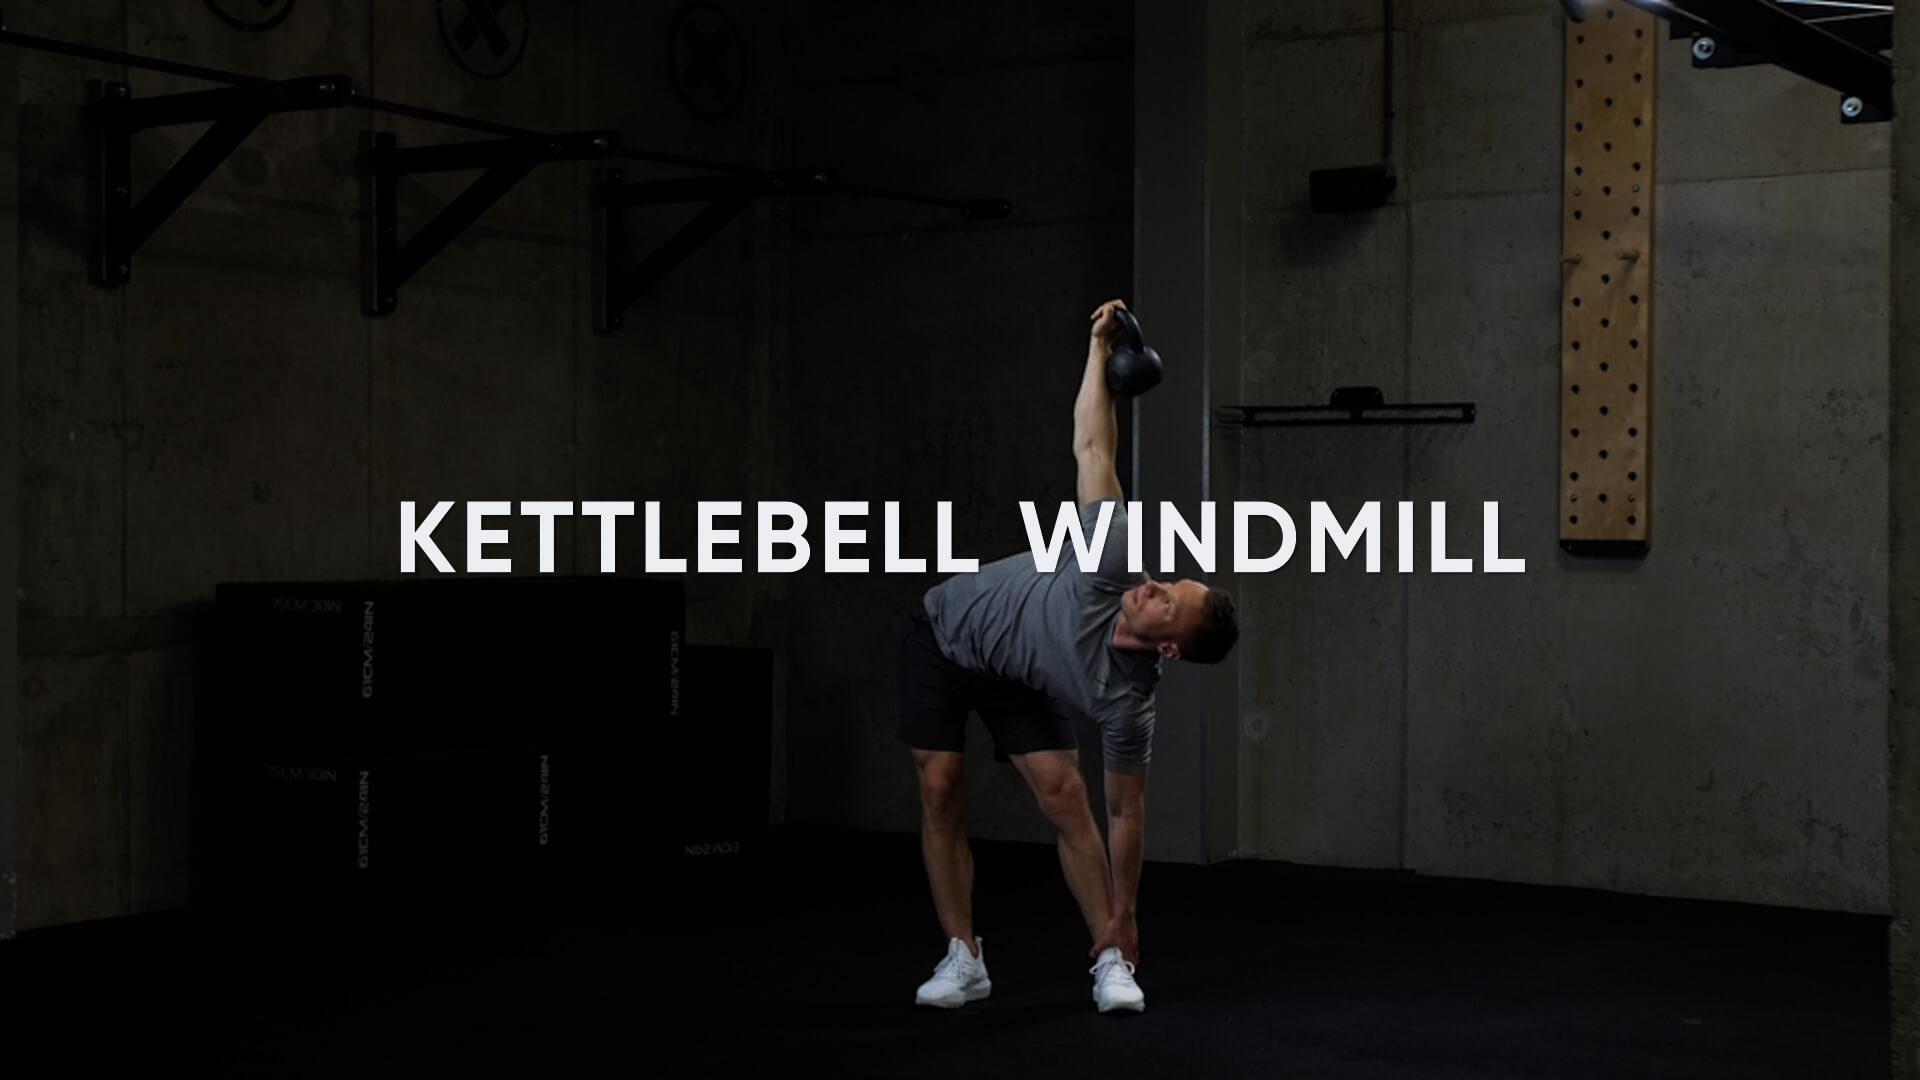 Kettlebell Windmill